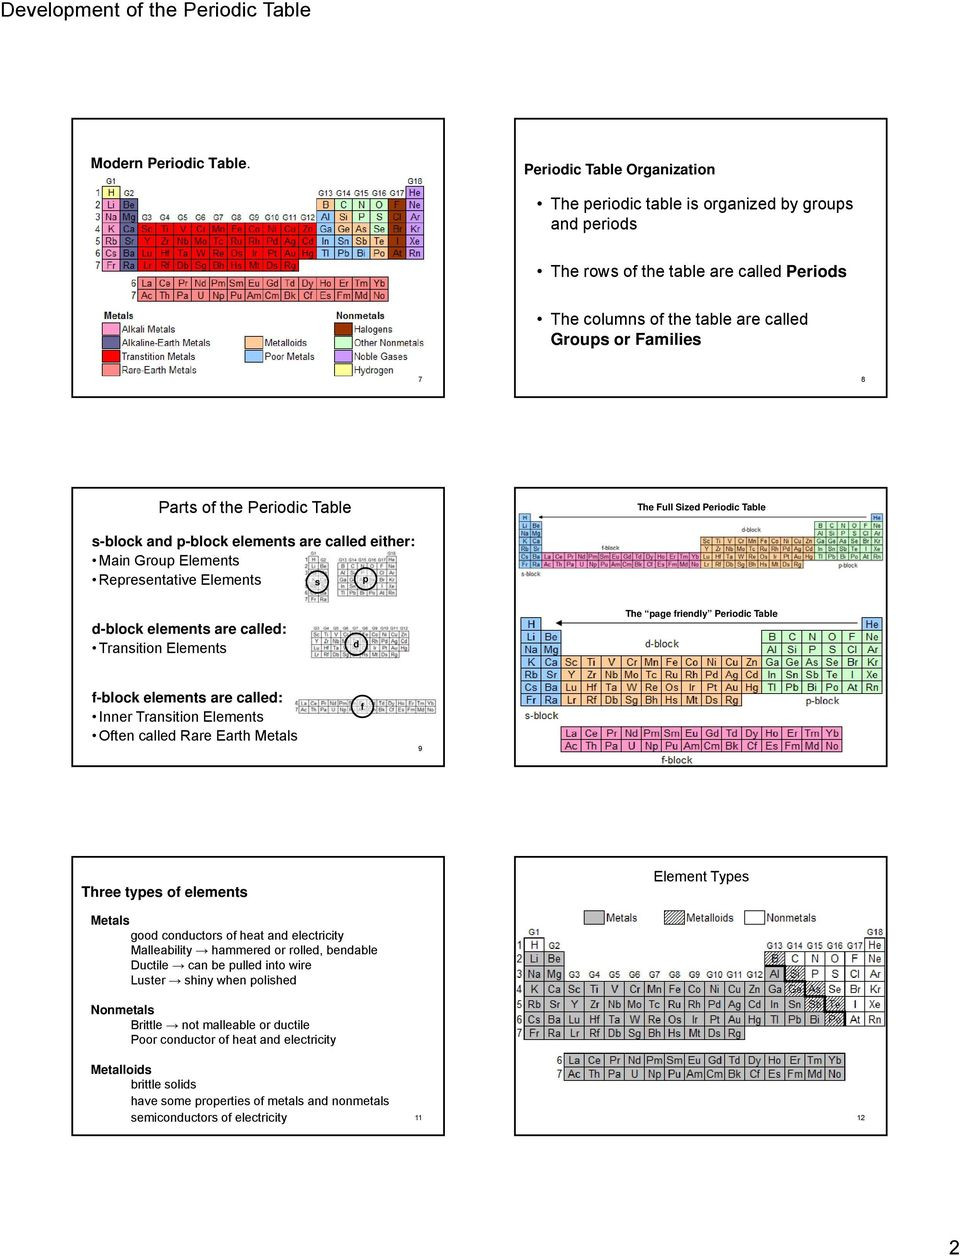 Nova Hunting the Elements Worksheet Pbs Nova Hunting the Elements Worksheet Answers Nidecmege